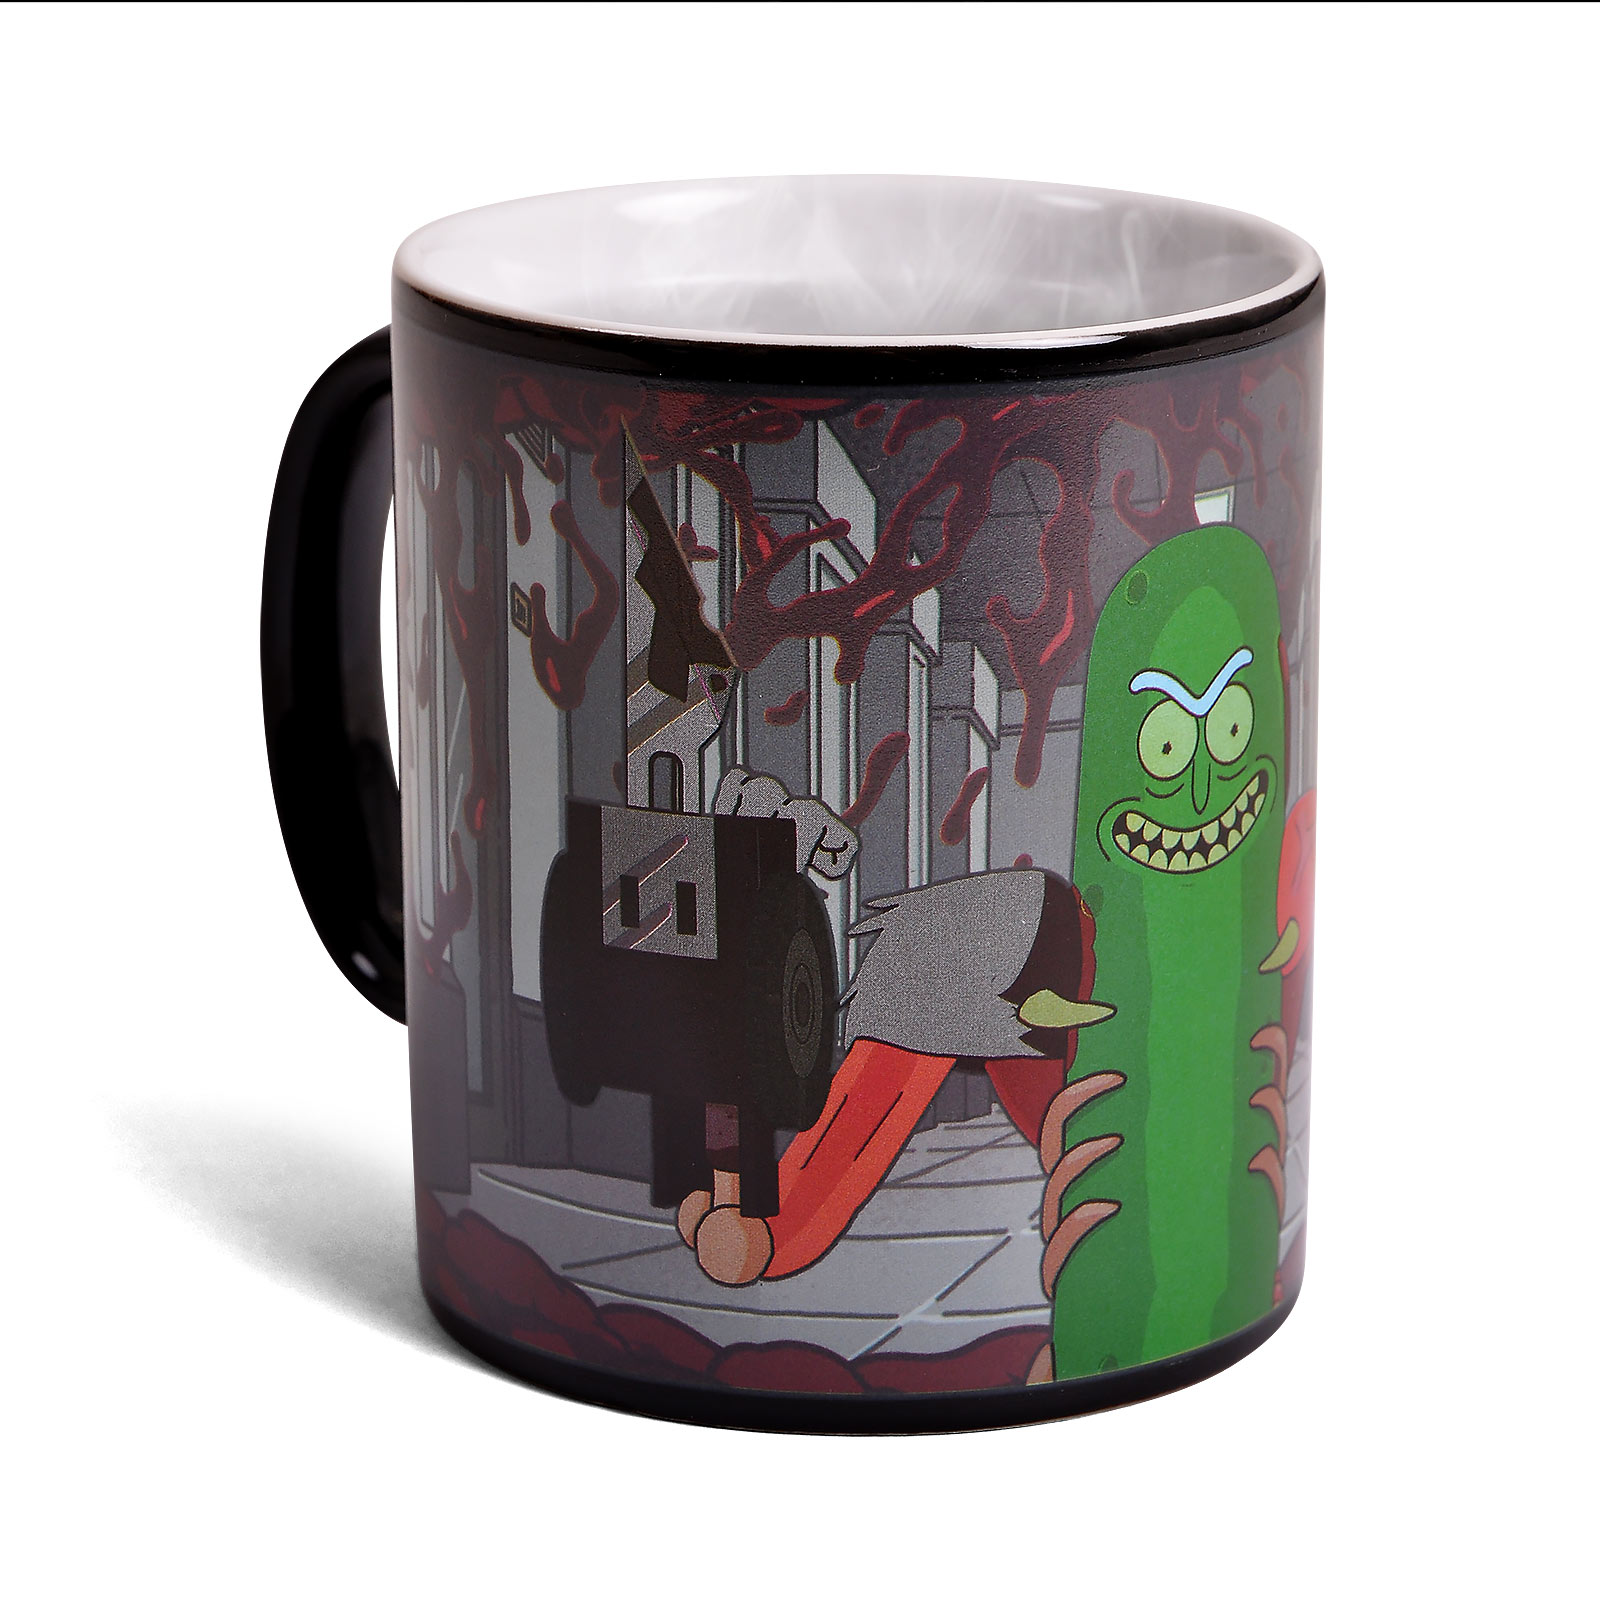 Rick and Morty - Pickle Rick Thermoeffekt Tasse